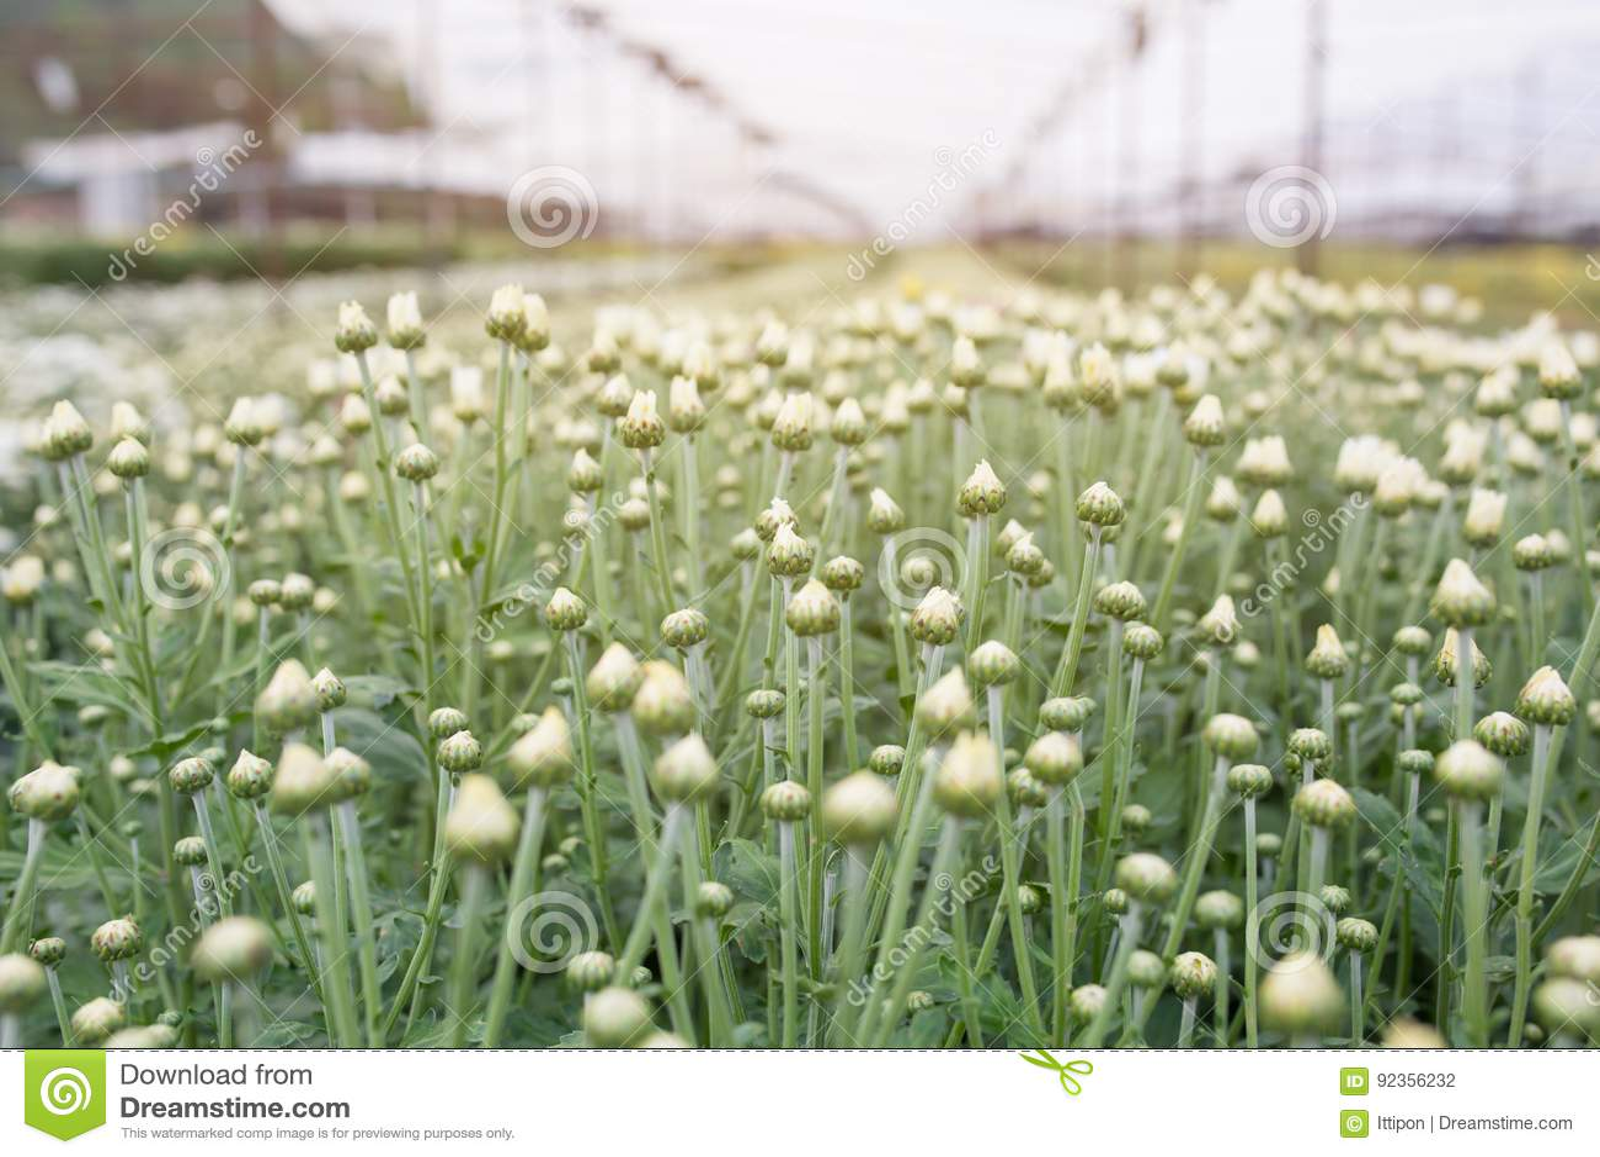 Fleurs blanches de chrysanthemum